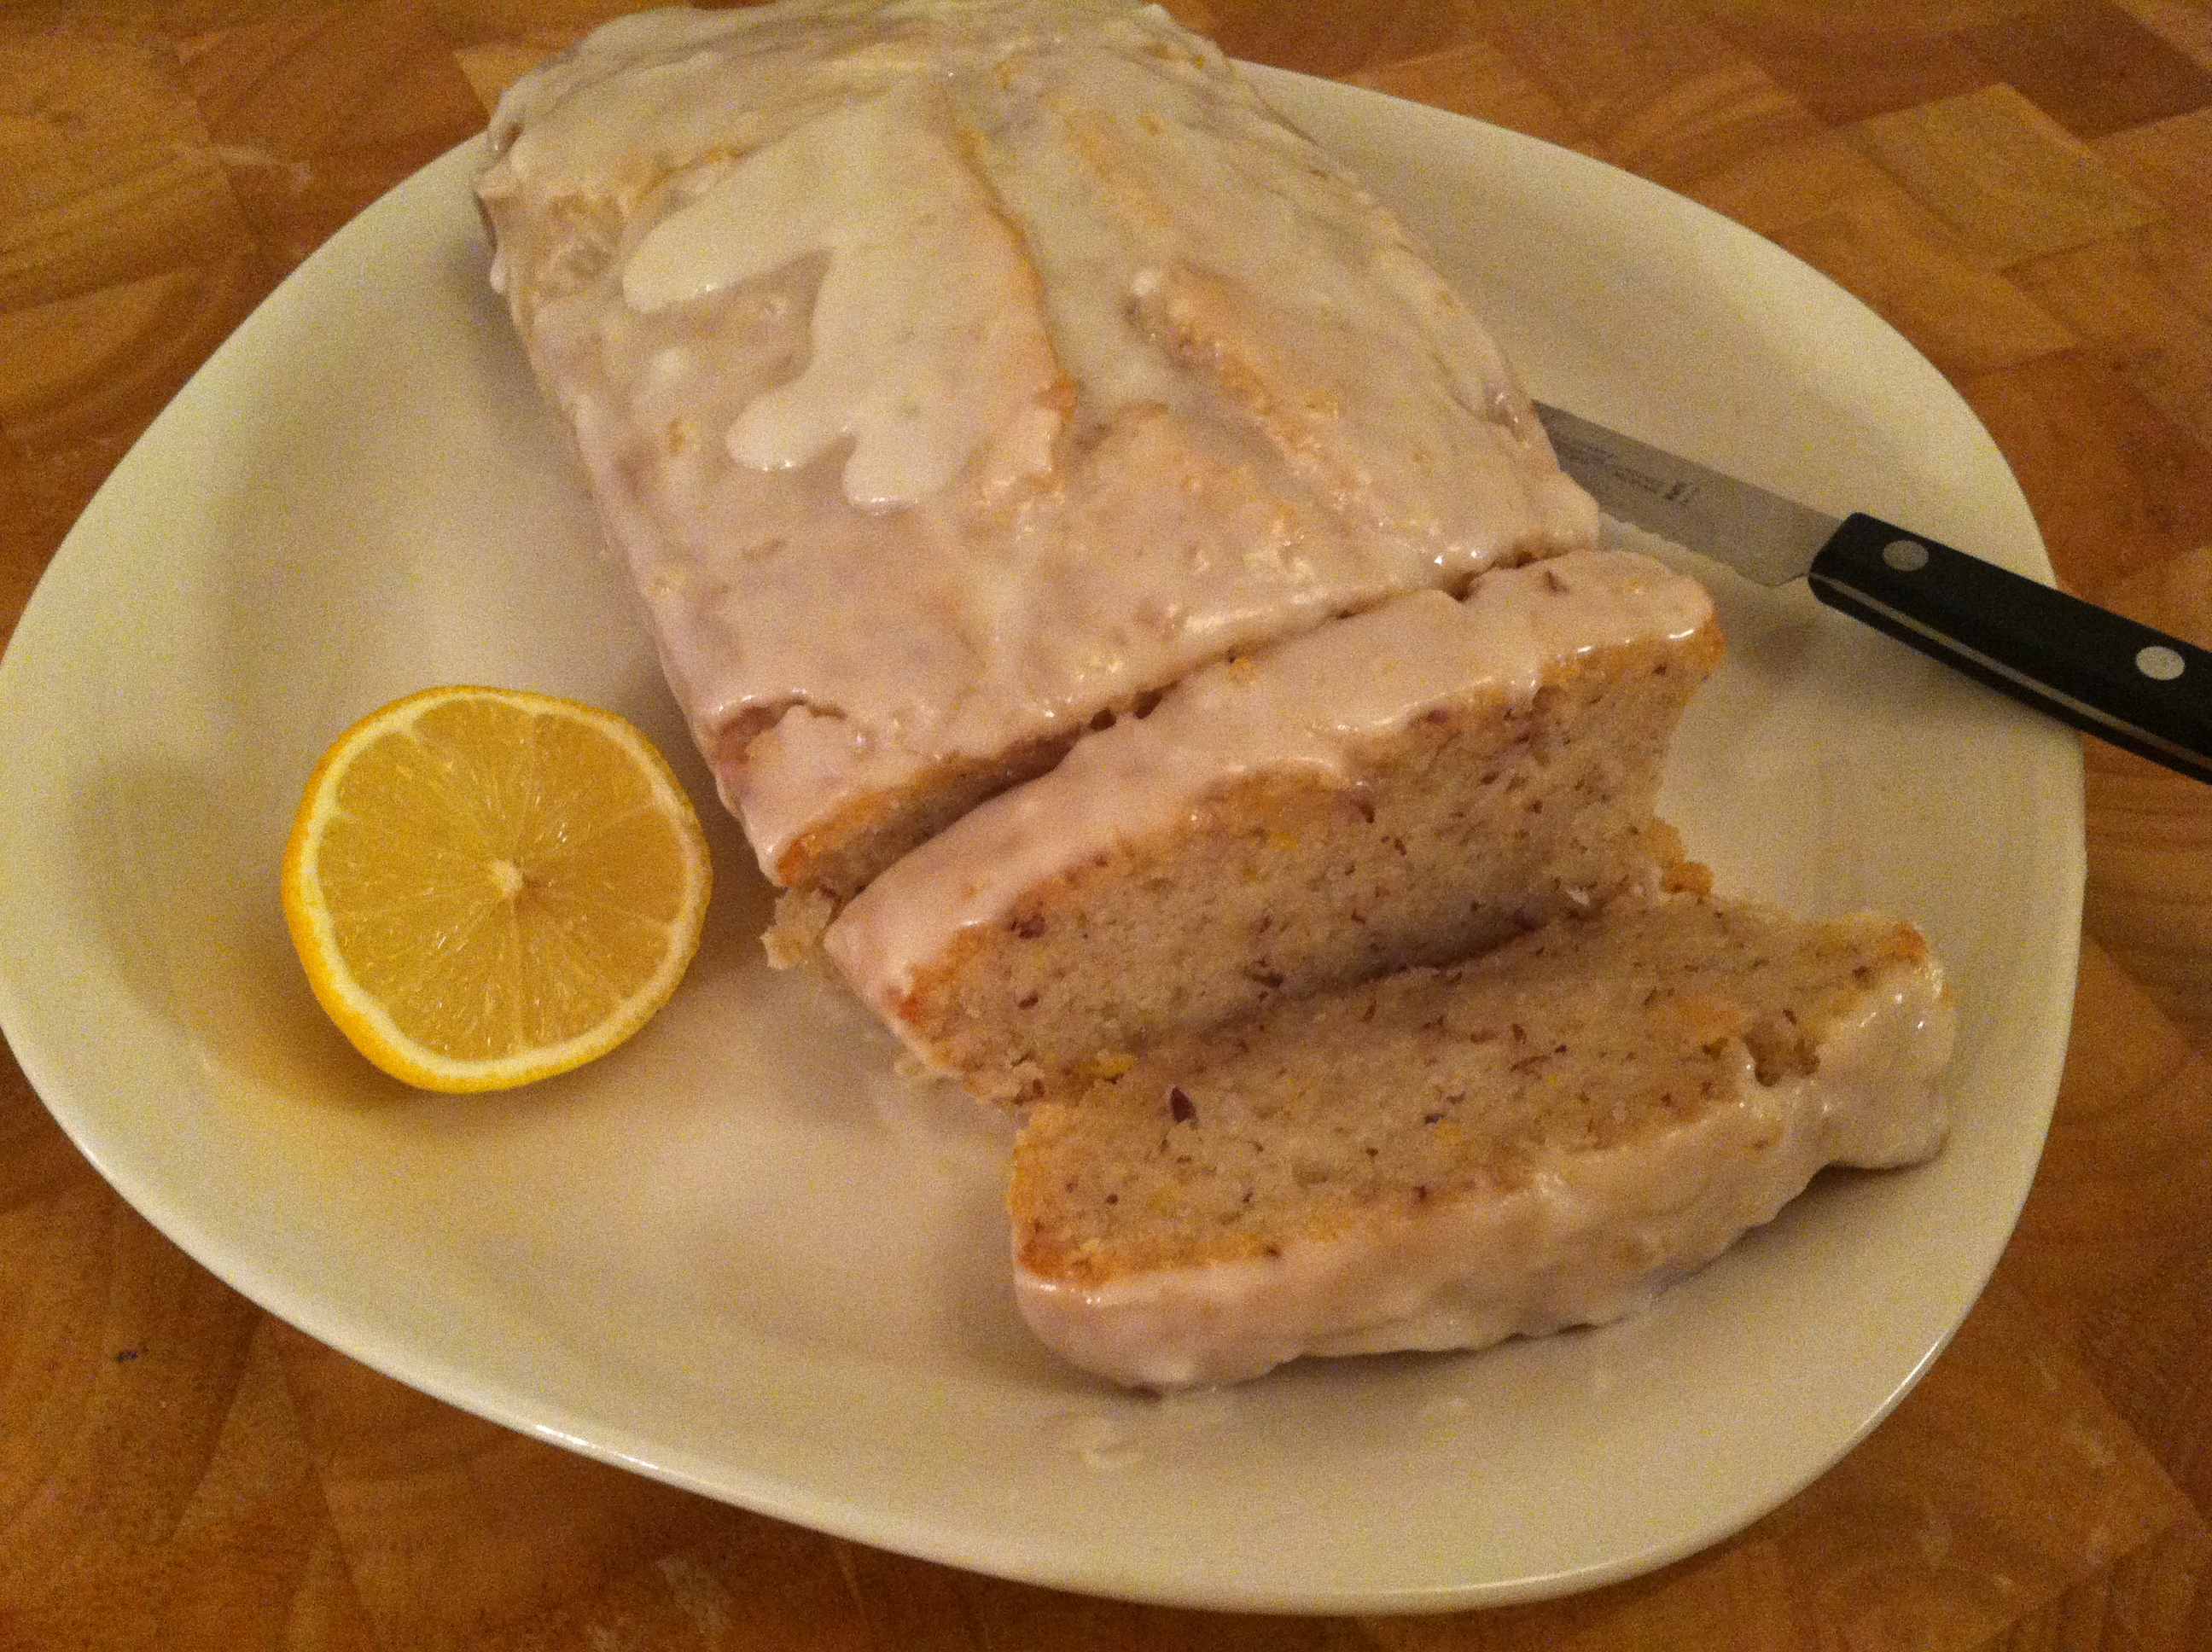 Barefoot Contessa Lemon Cake By Ina Garten Recipes — Dishmaps